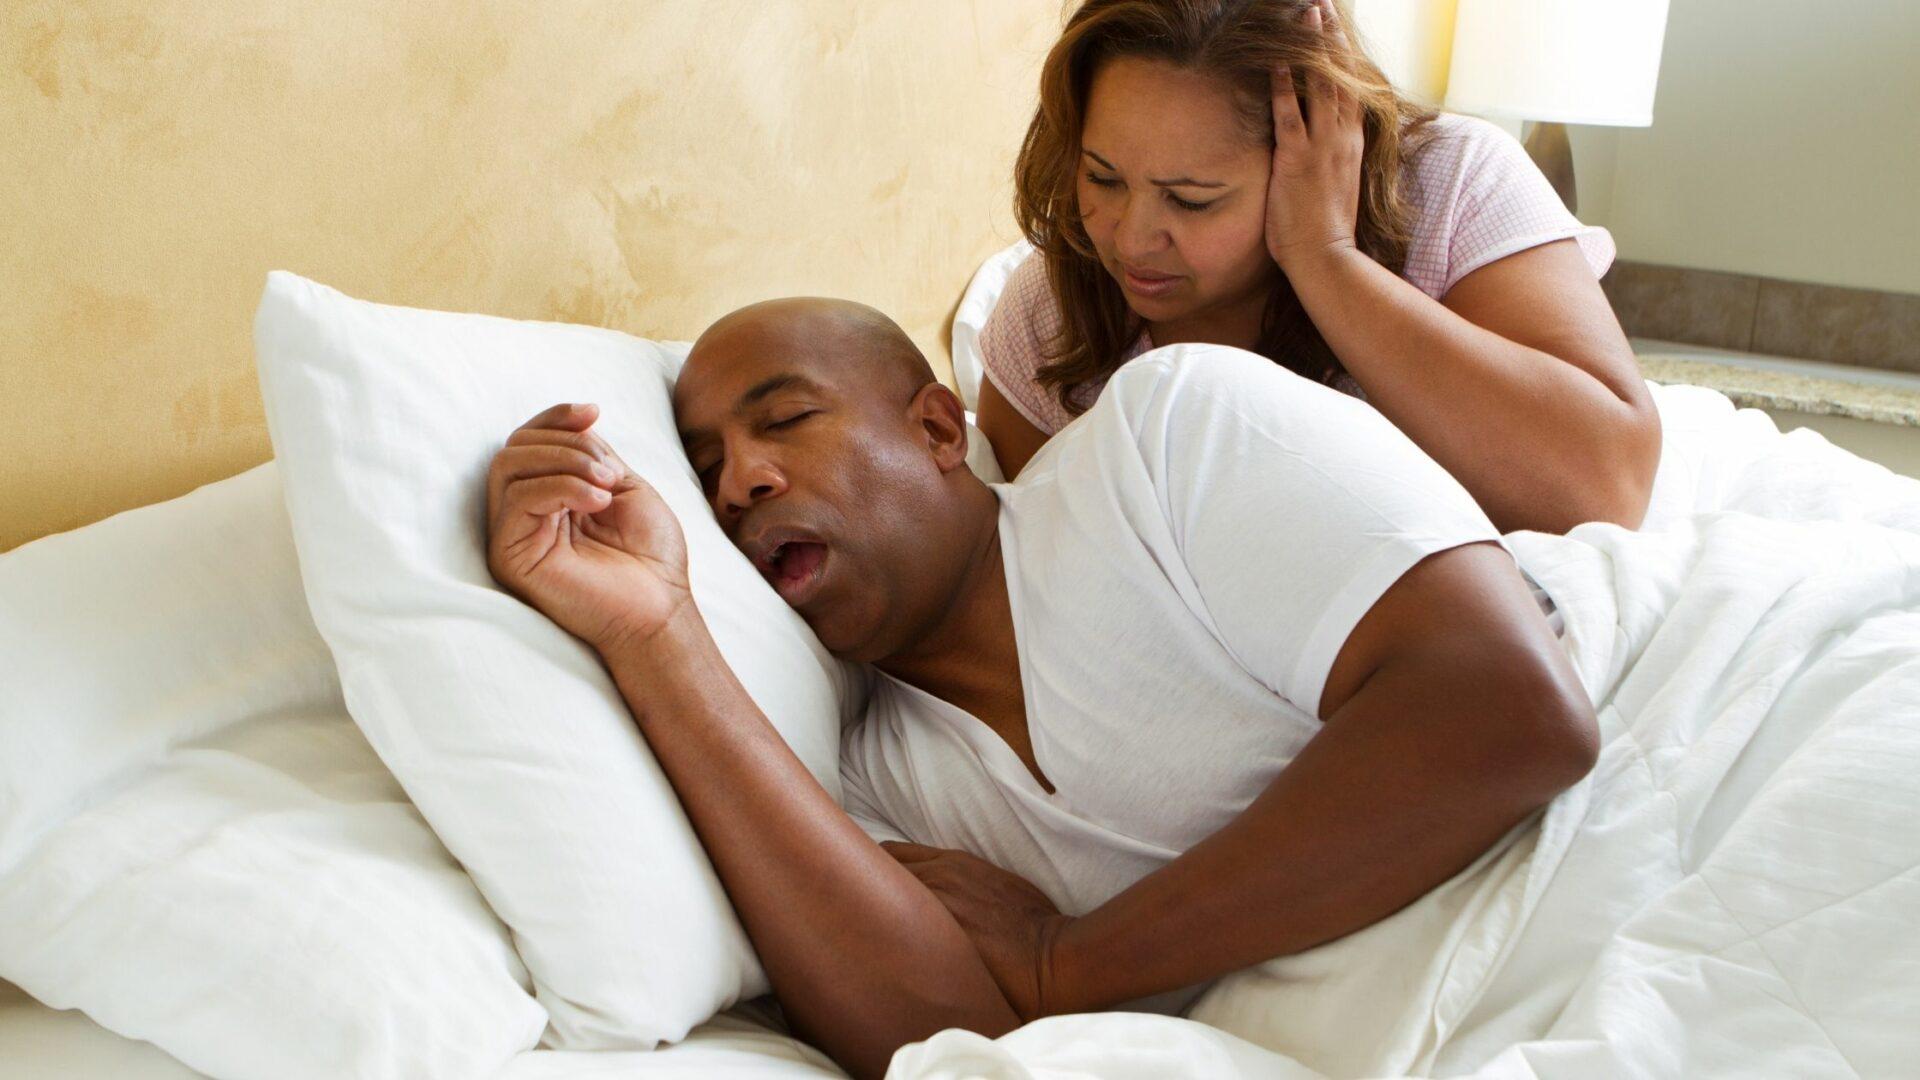 Is Snoring The Same As Sleep Apnea?